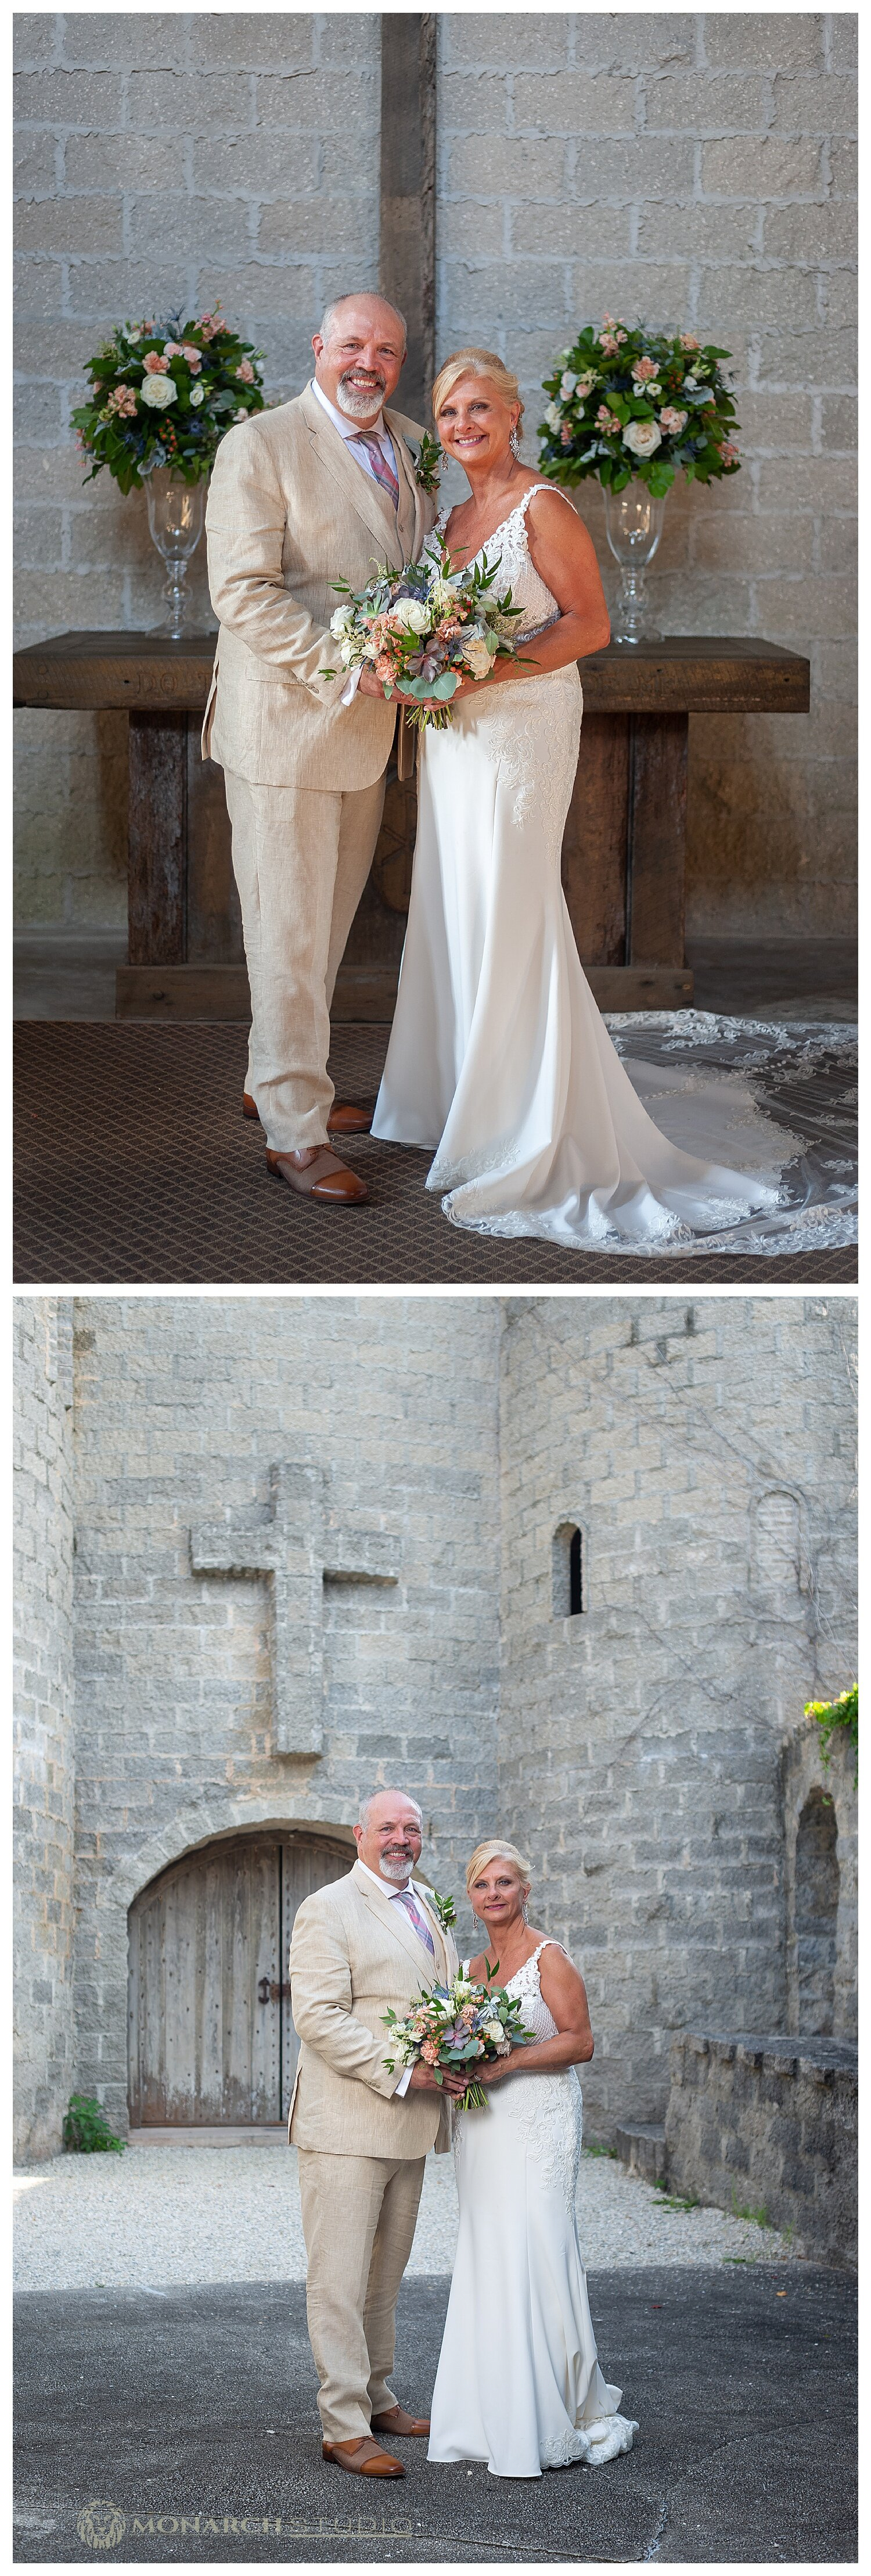 Florida Castle Wedding - St. Augustine 020.JPG